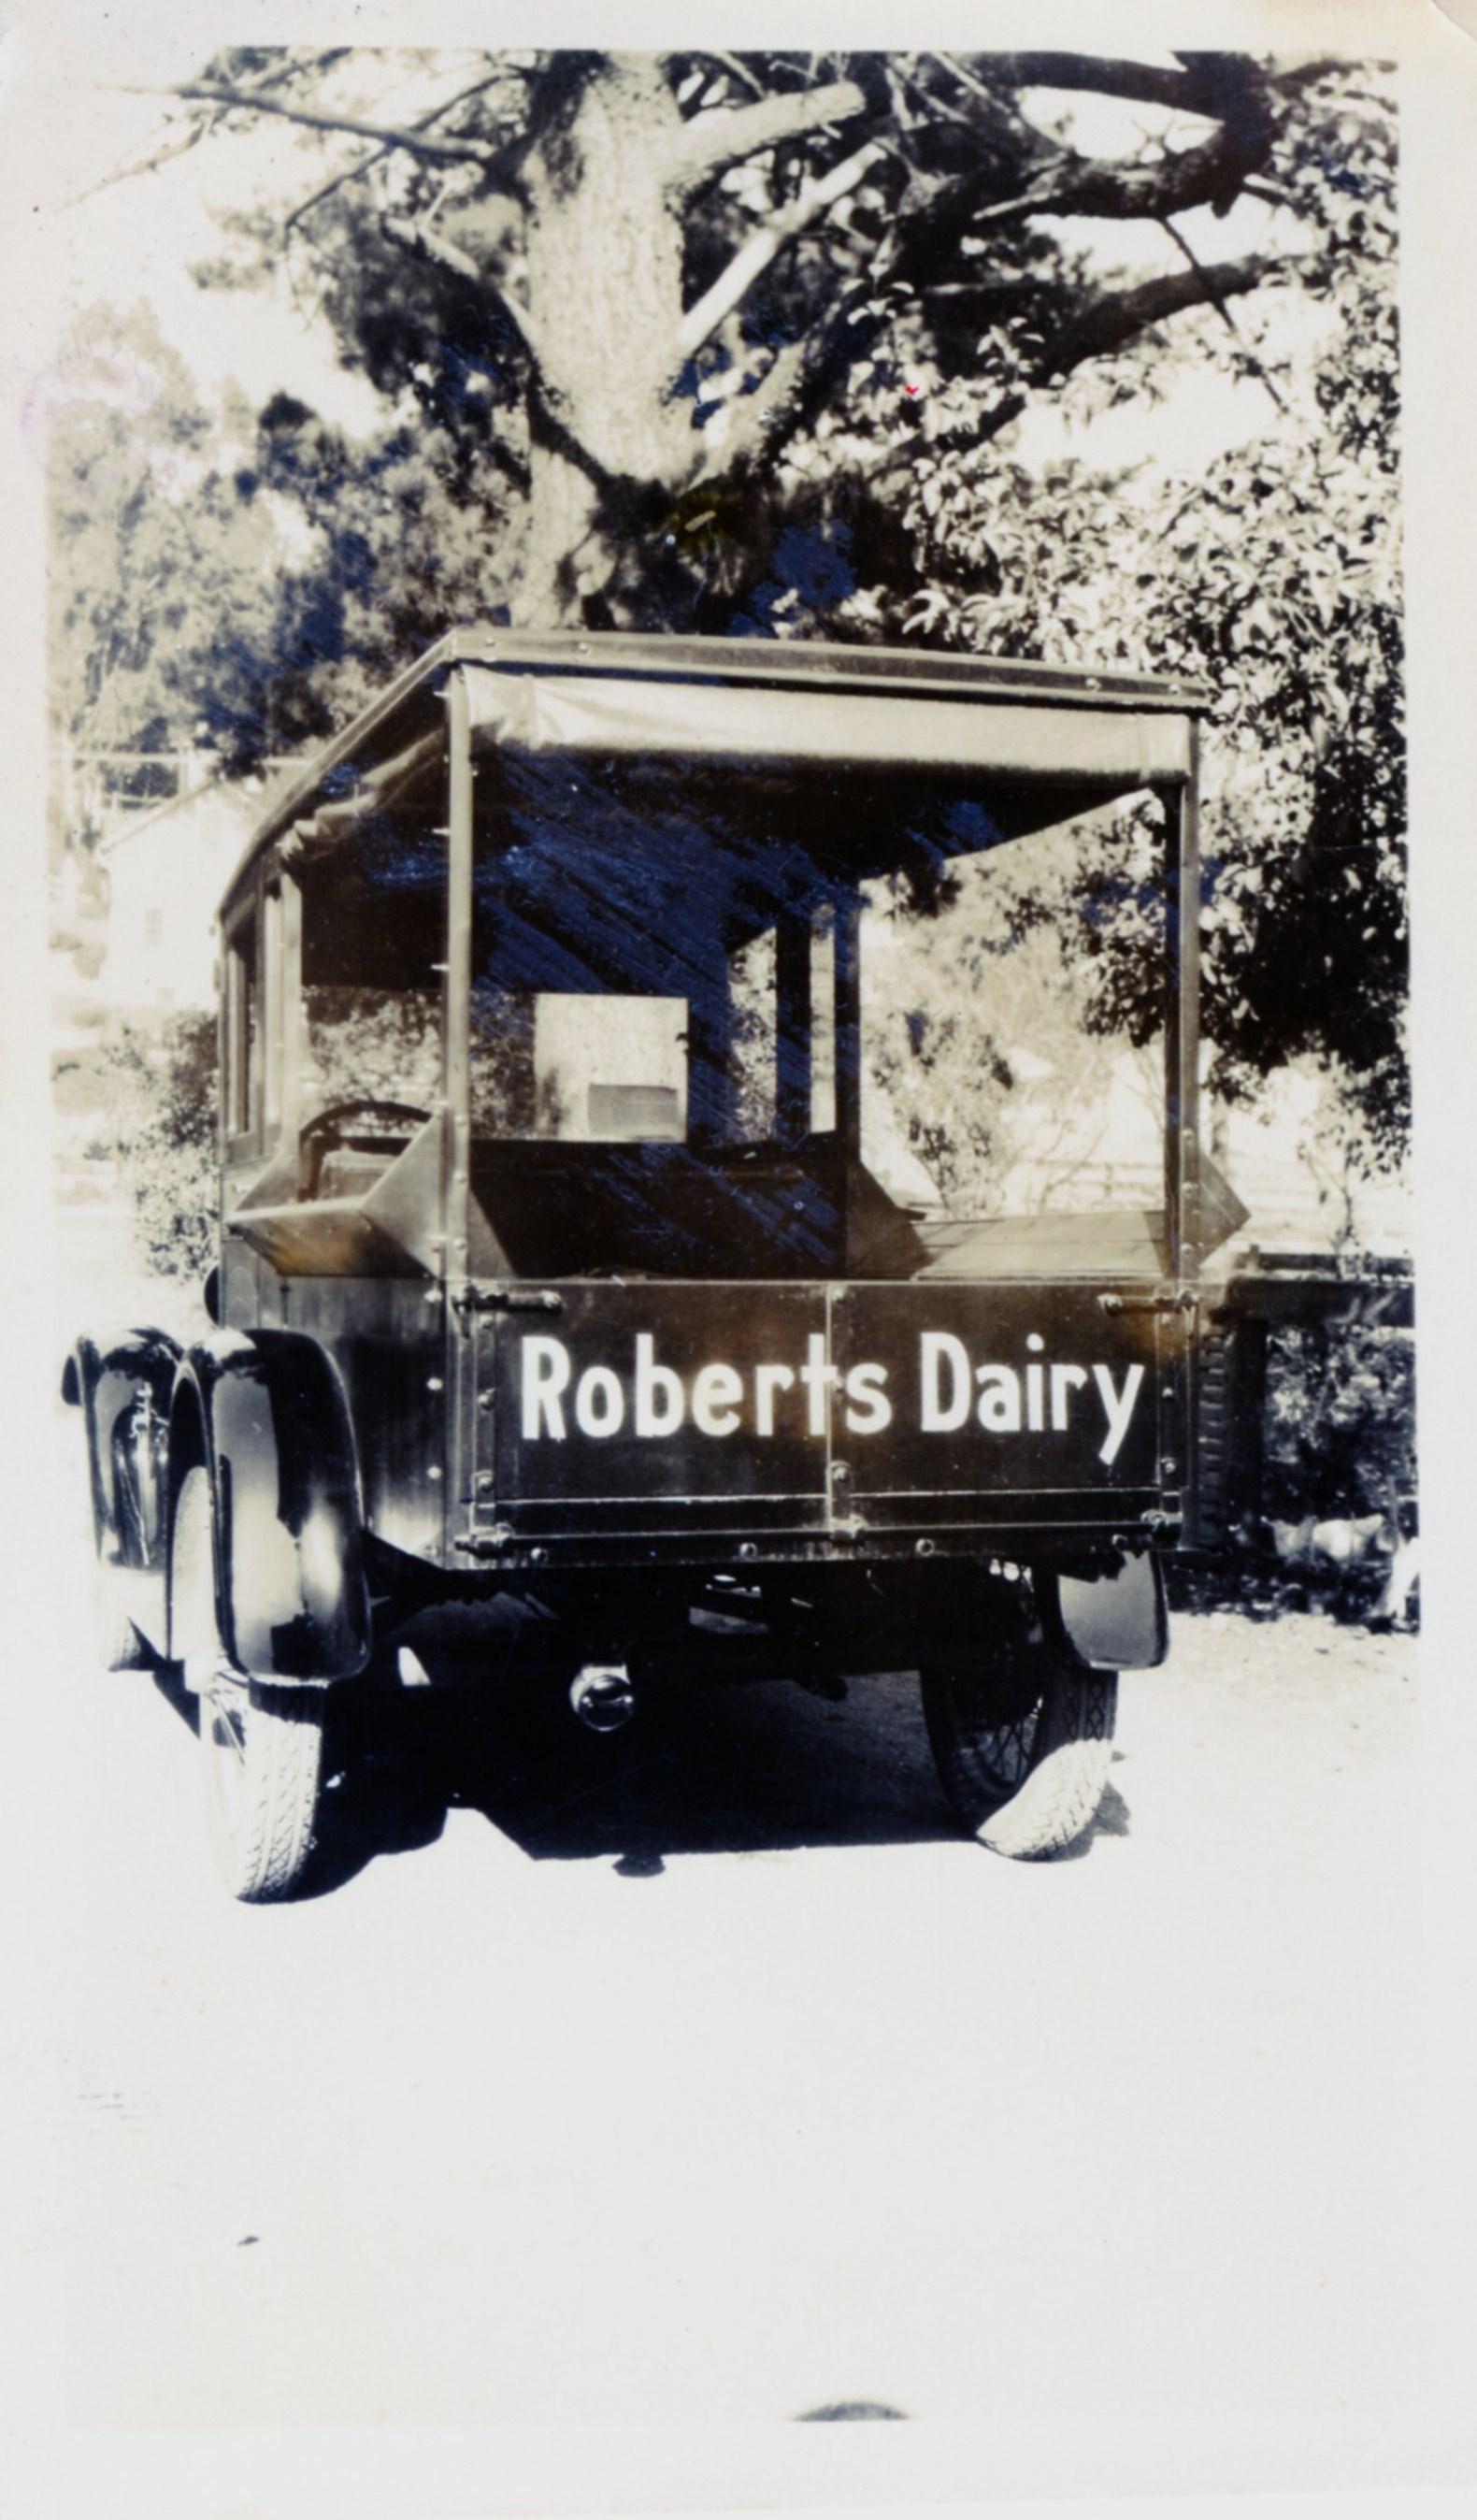 RobertsDairyCar